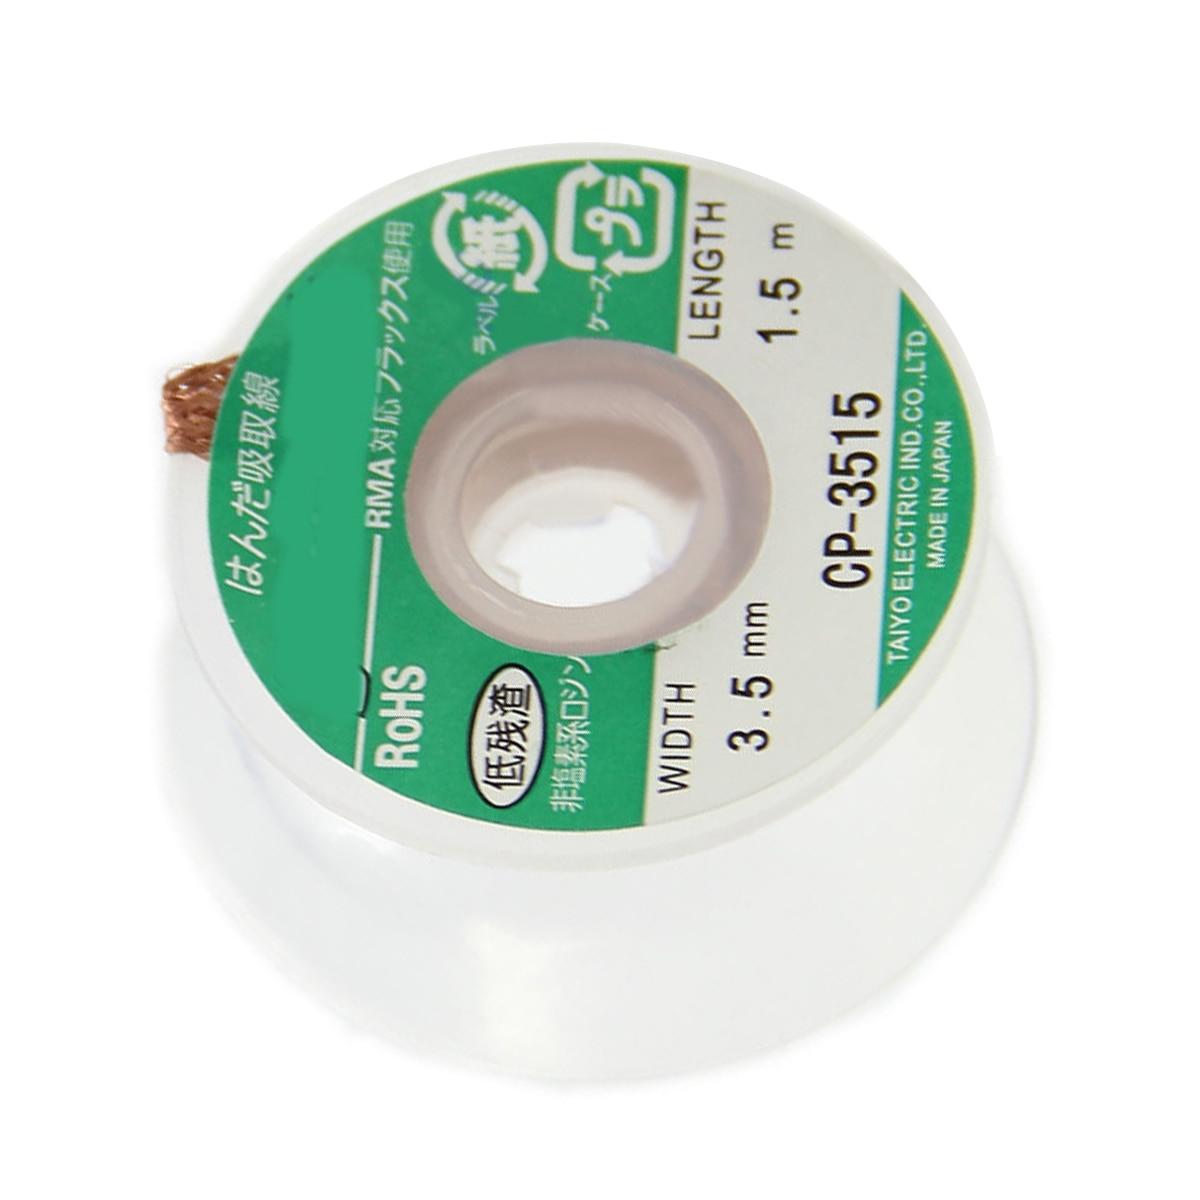 1 Roll CP-3515 Desoldering Braid Copper Desolder Wick Solder Remover Wick 1.5m Length 3.5mm Width Welding Wires Tool